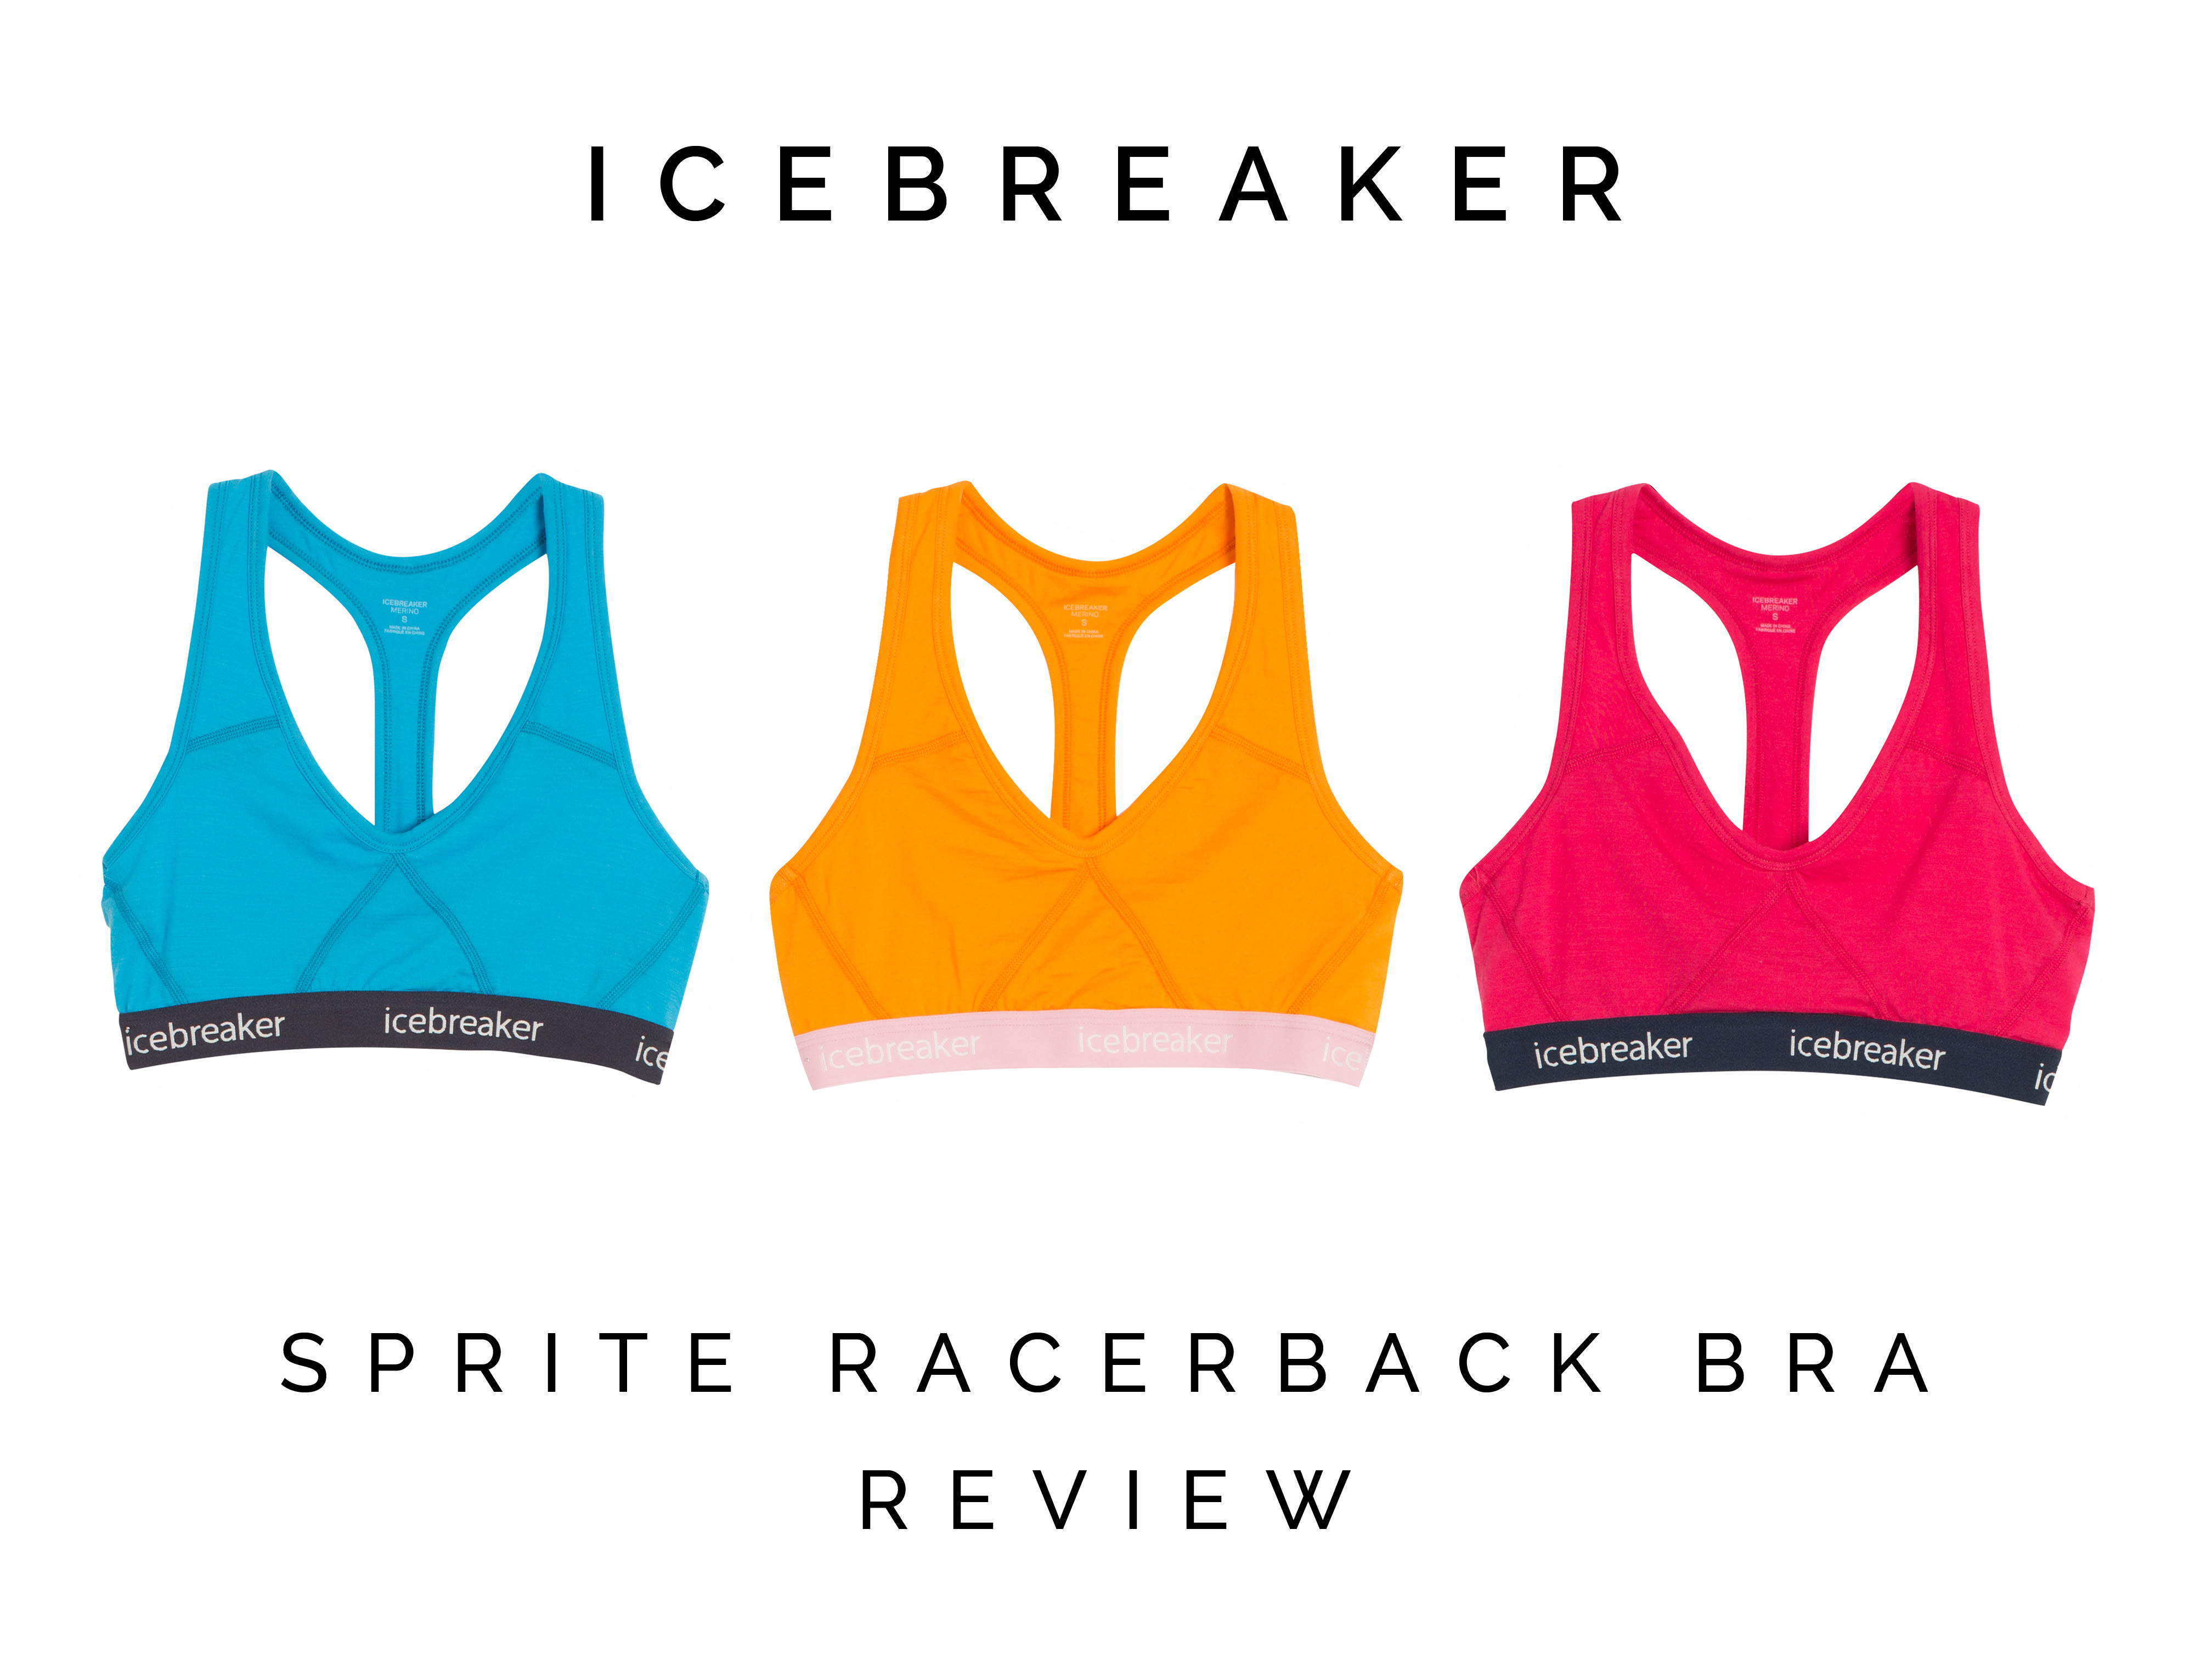 53dbac0b9d Icebreaker Sprite Racerback Bra Review